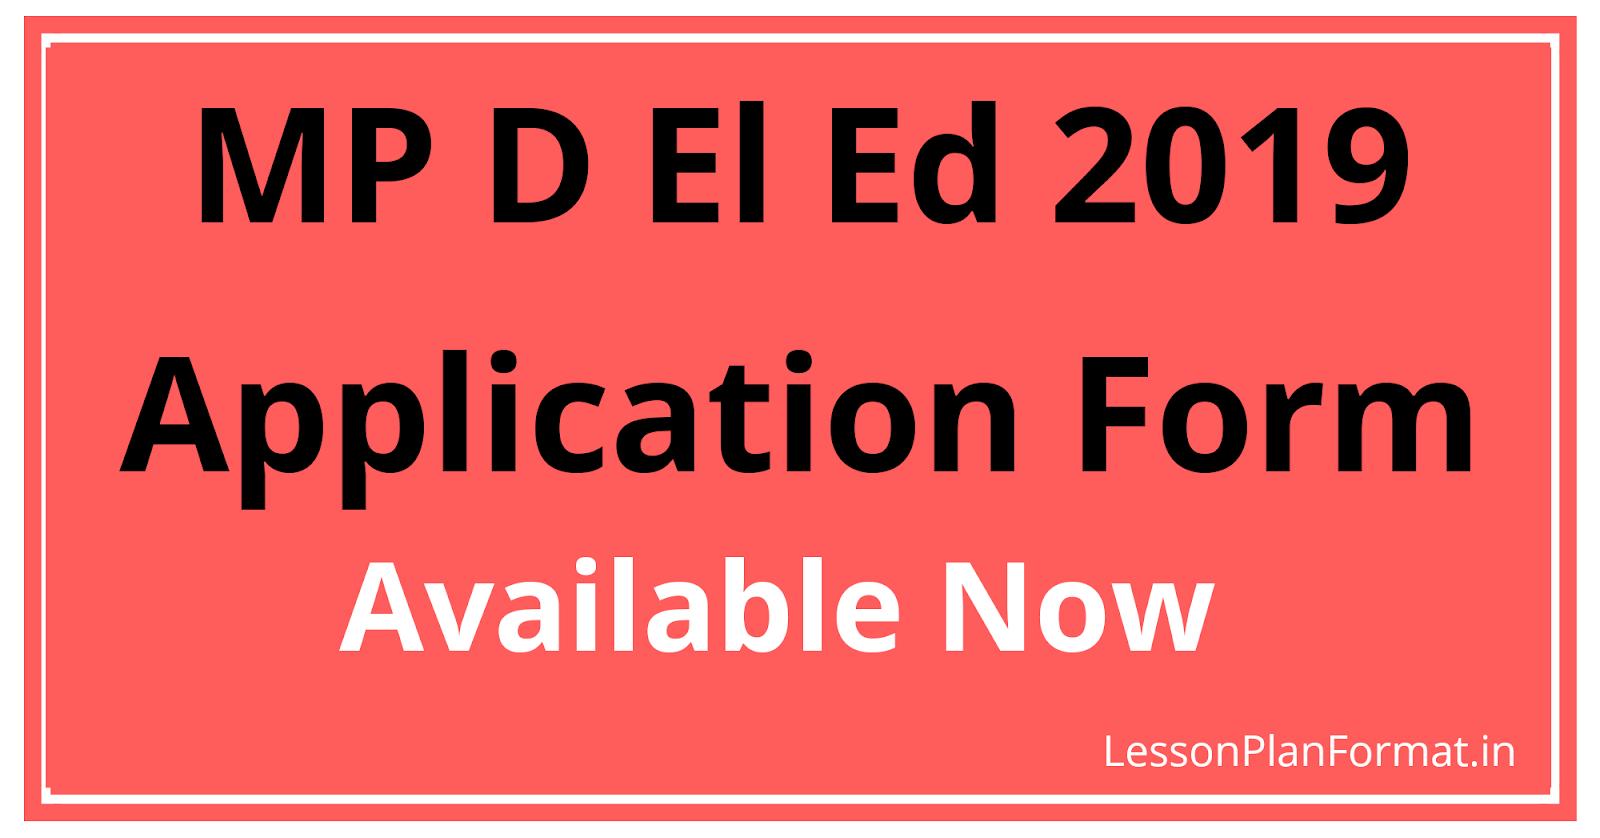 M P D El Ed Counseling Application Form 2019